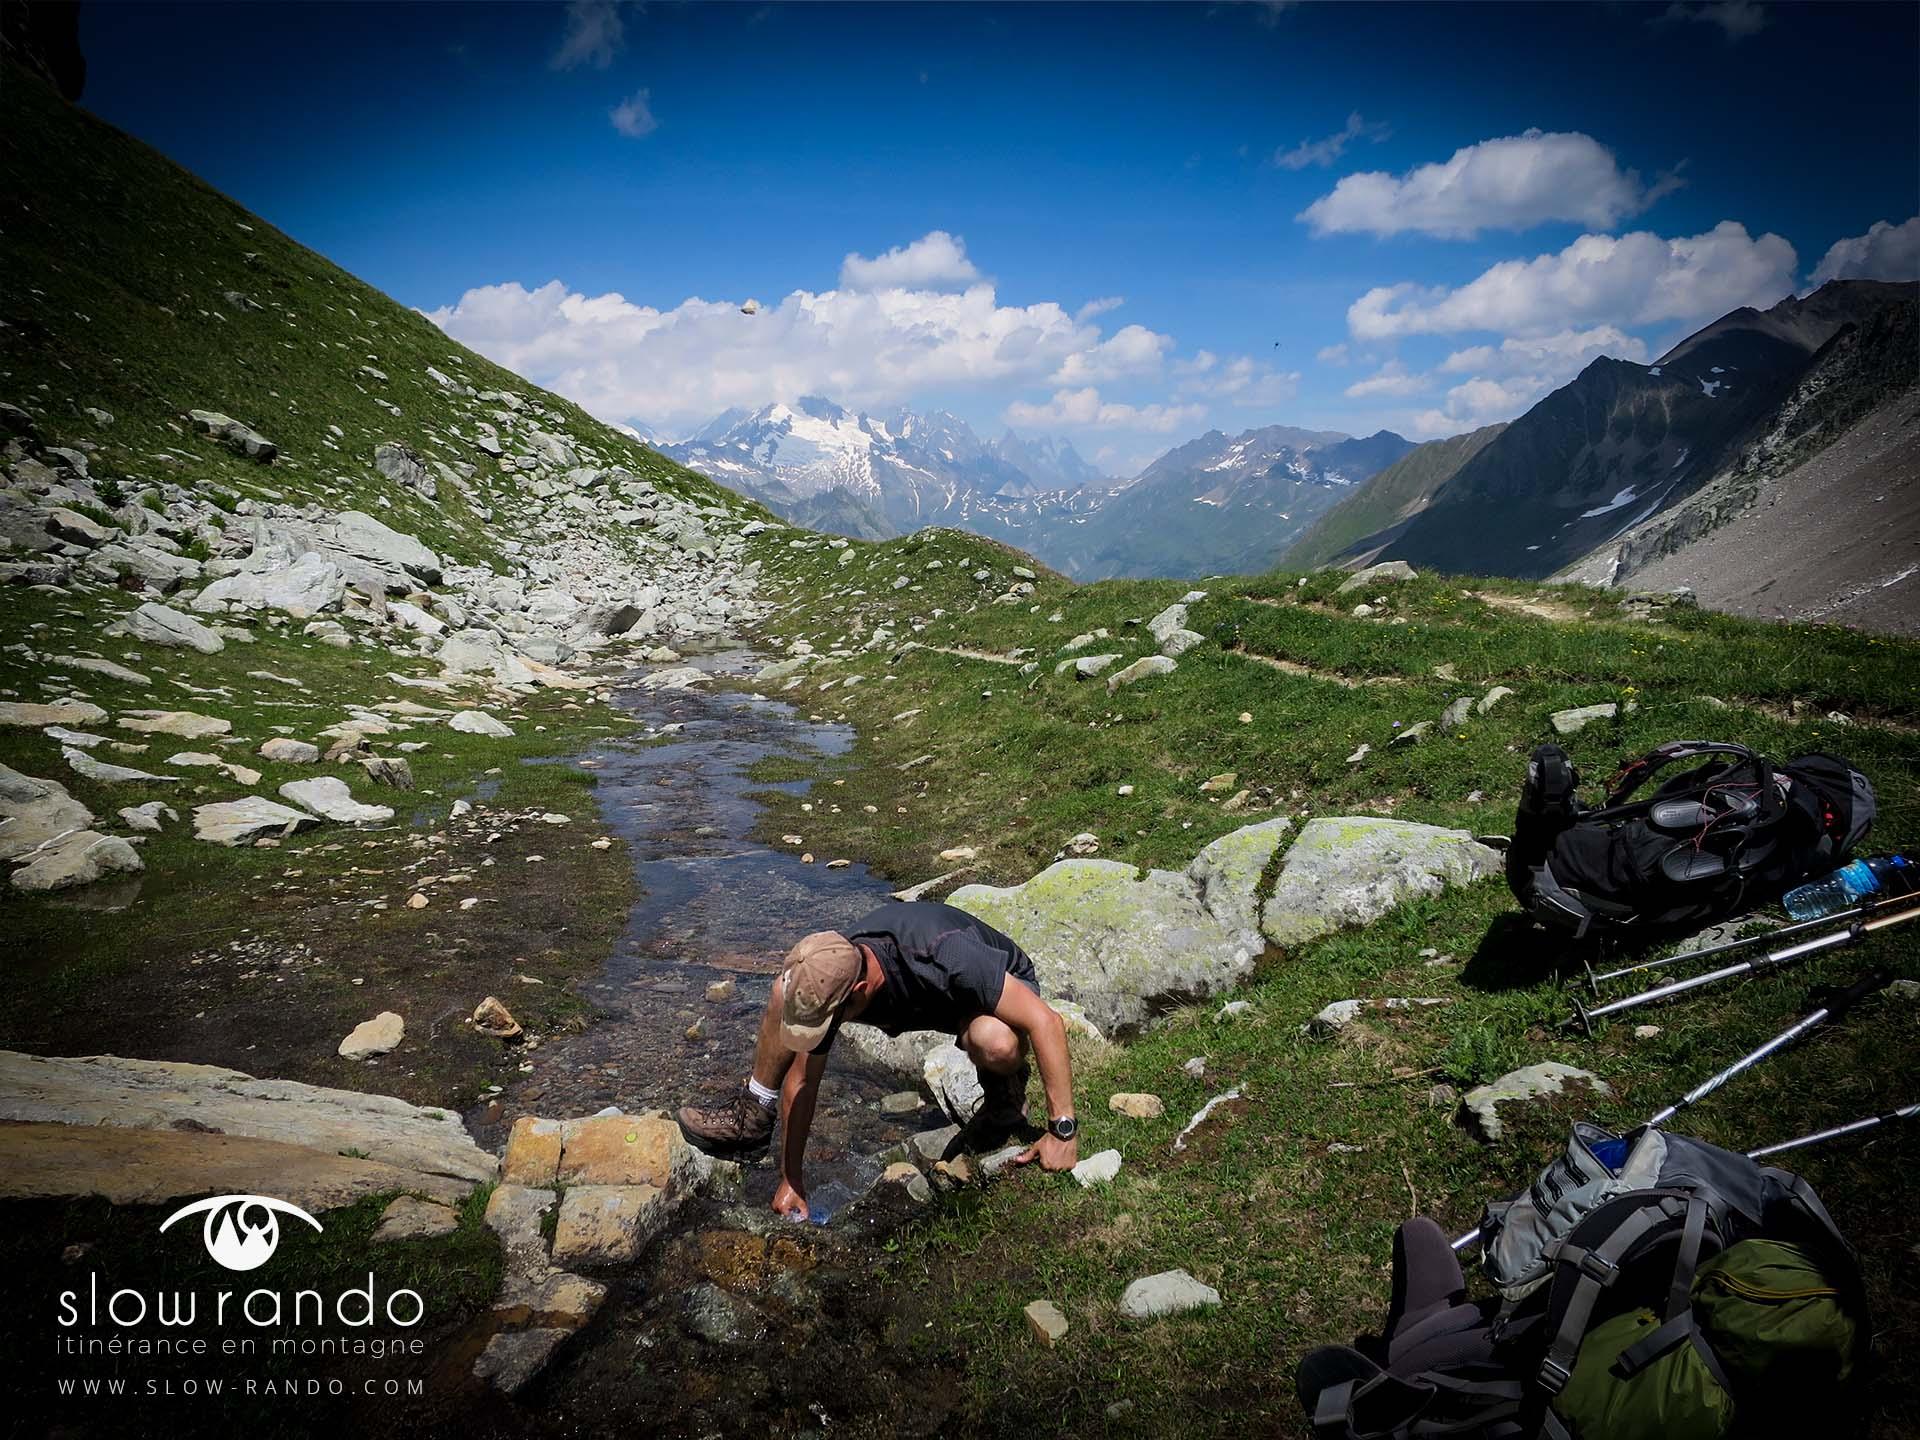 Beaufortain Tour Itinerance Trek Bivouac Combe Neuva Riviere Slow Rando